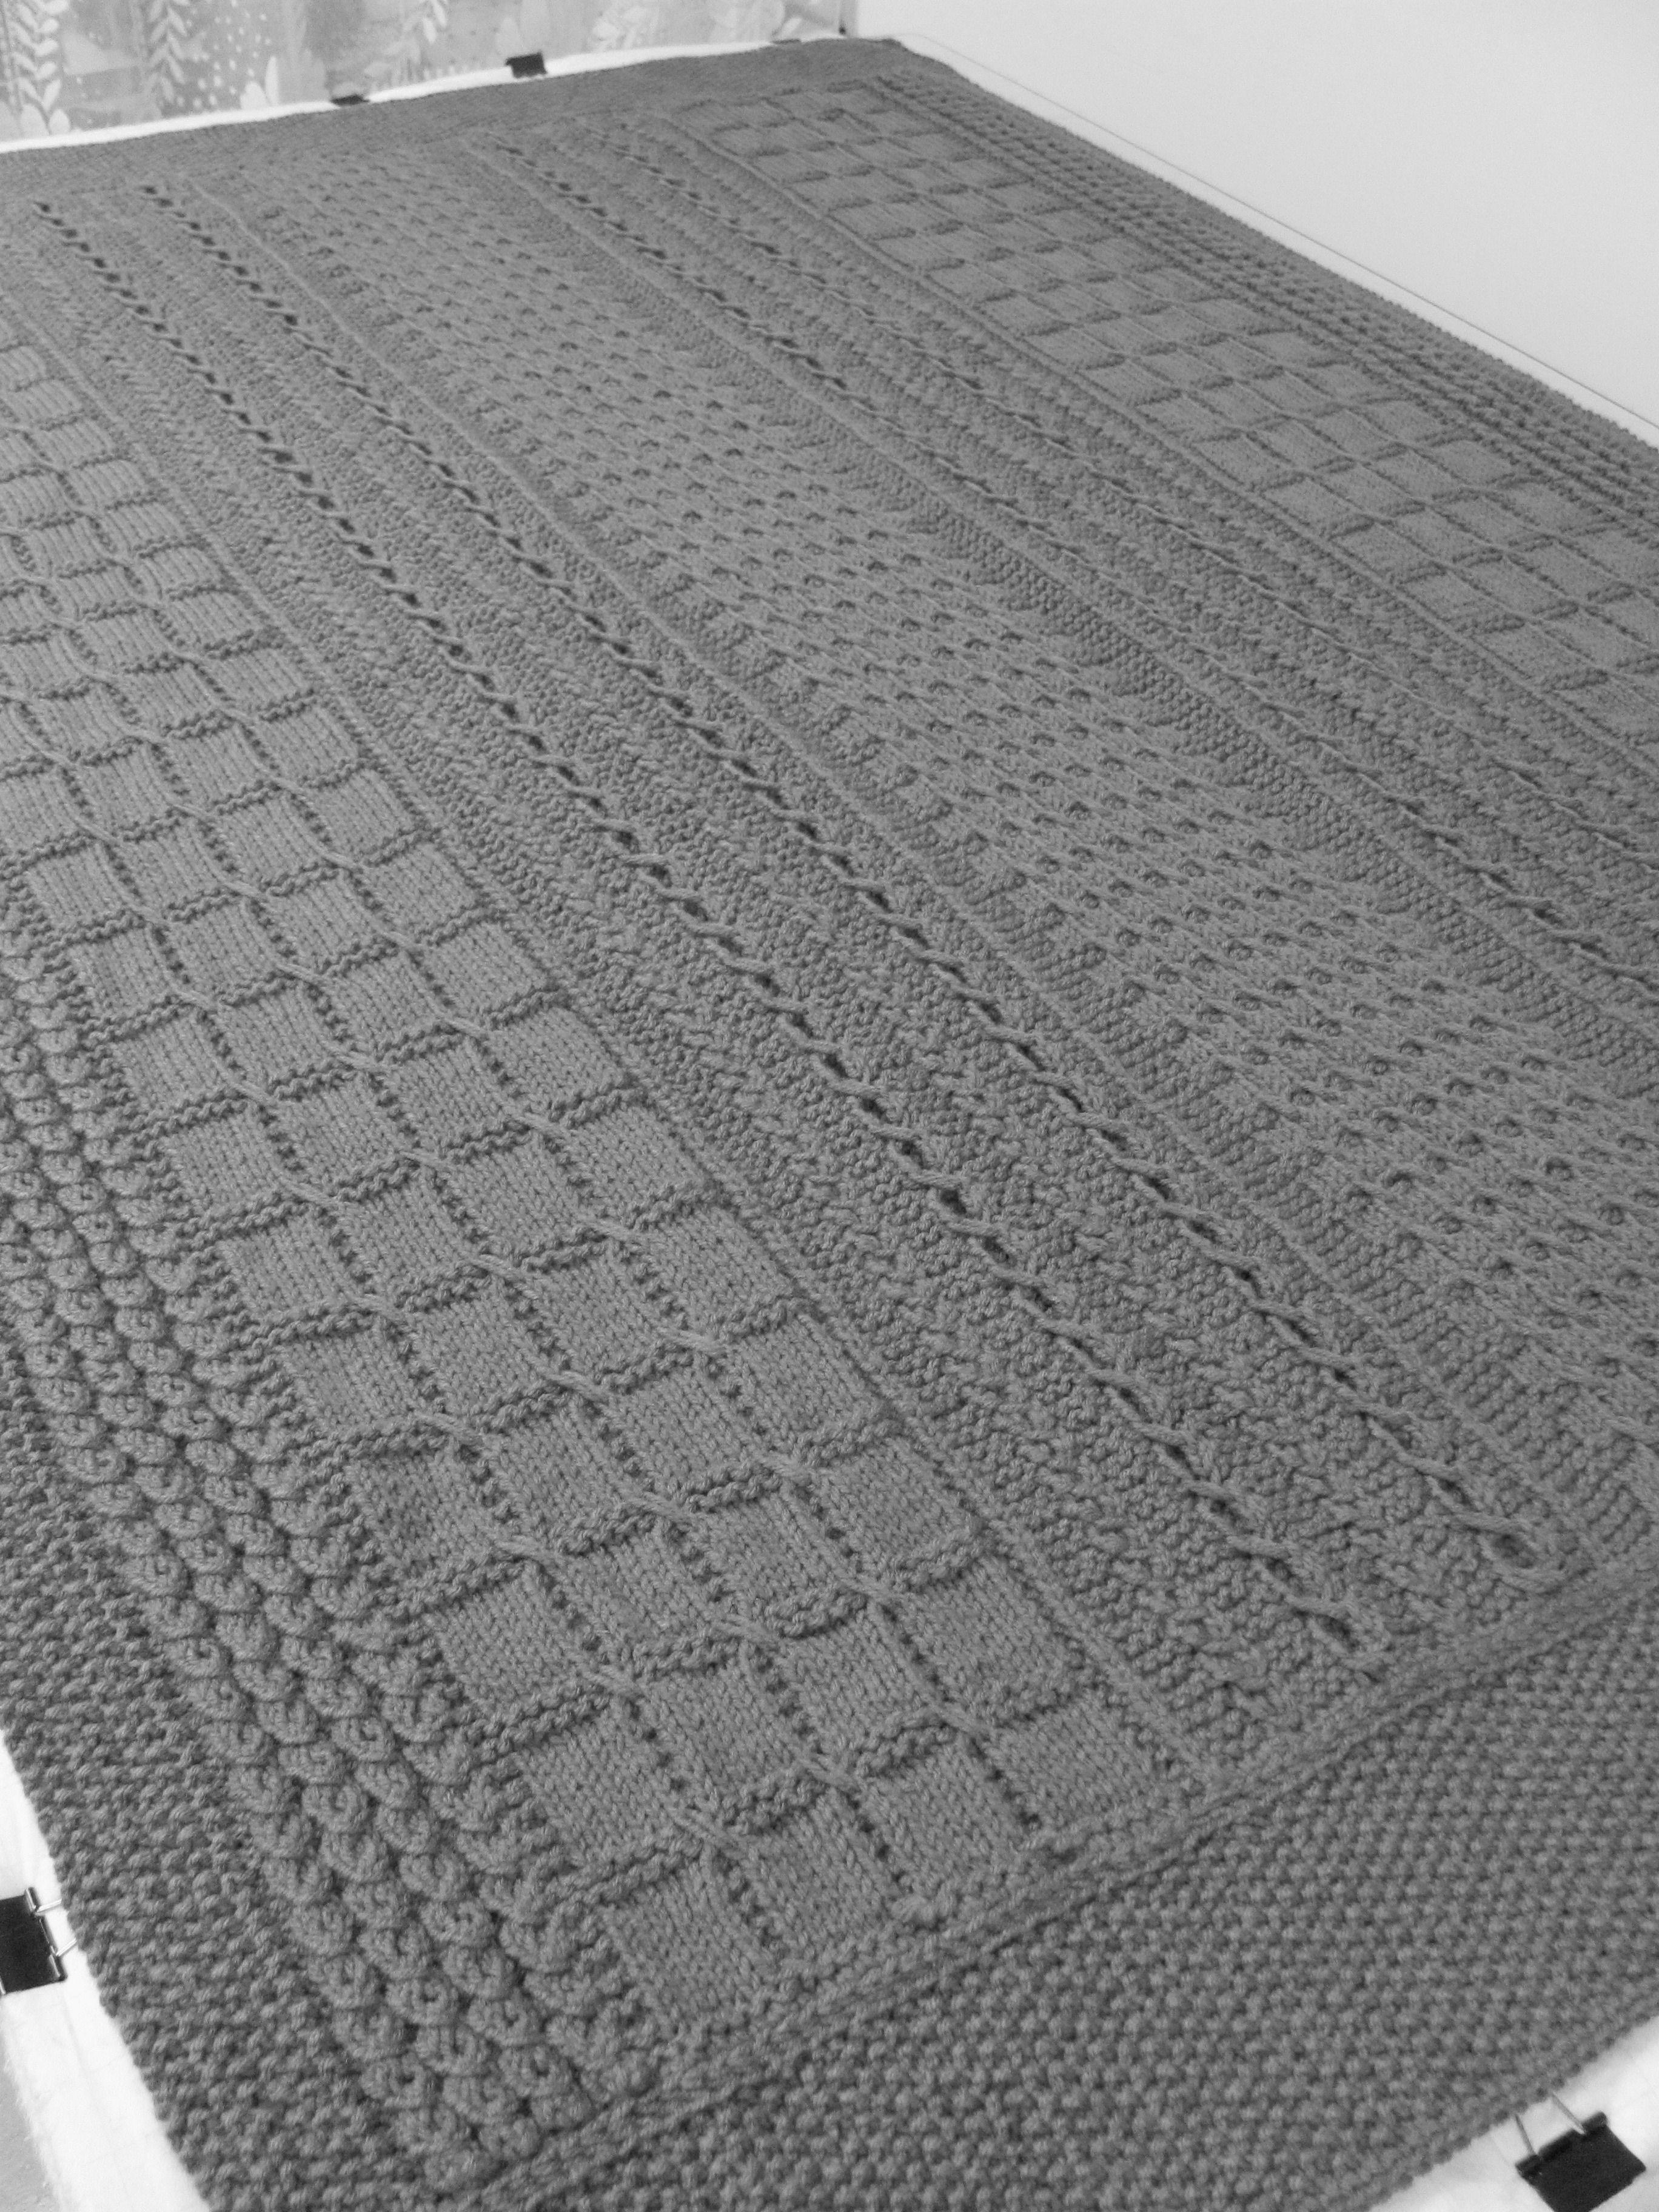 Skerin Aran Crochet Afghan from KnitPicks.com (for the man in your ...